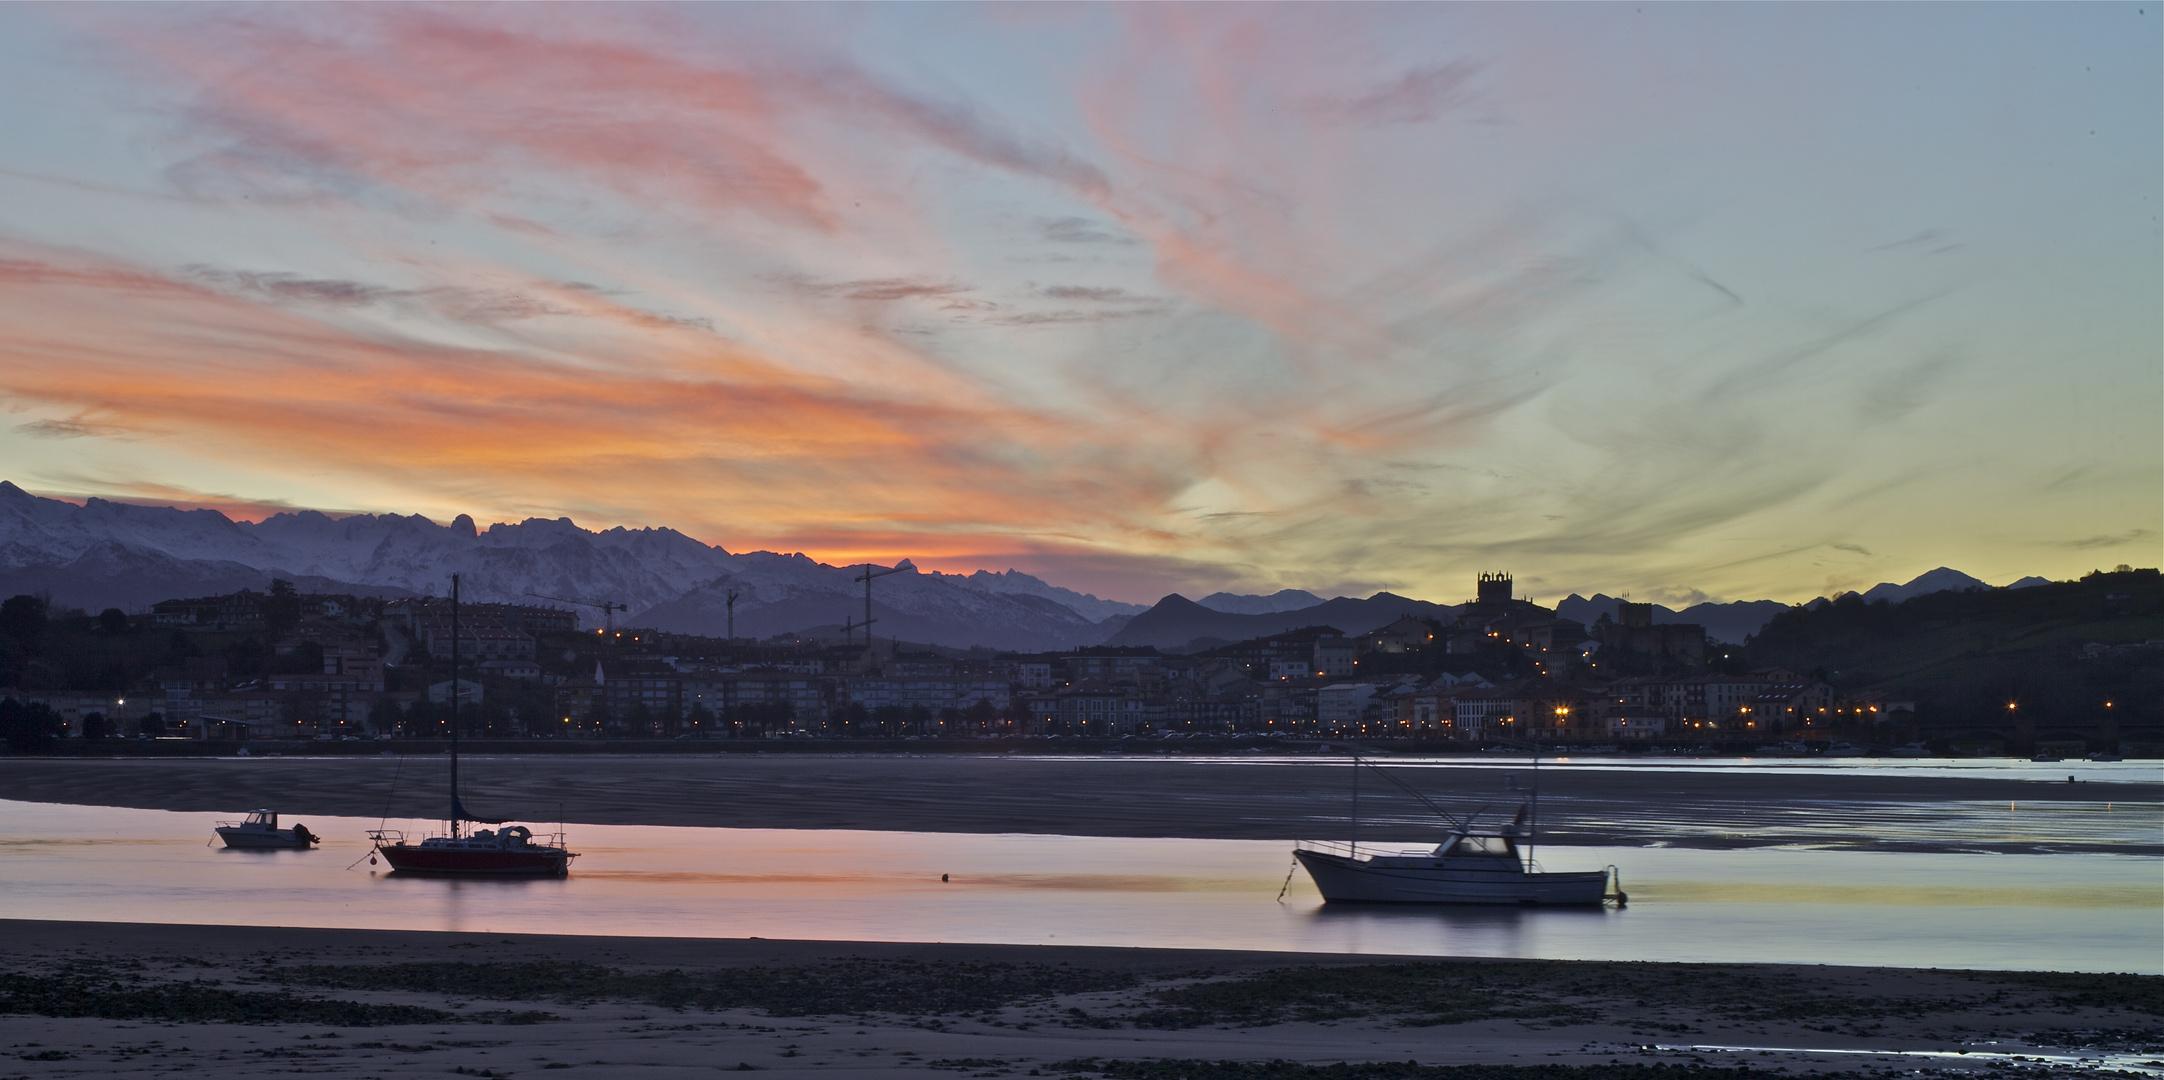 San Vicente de la Barquera-Cantabria